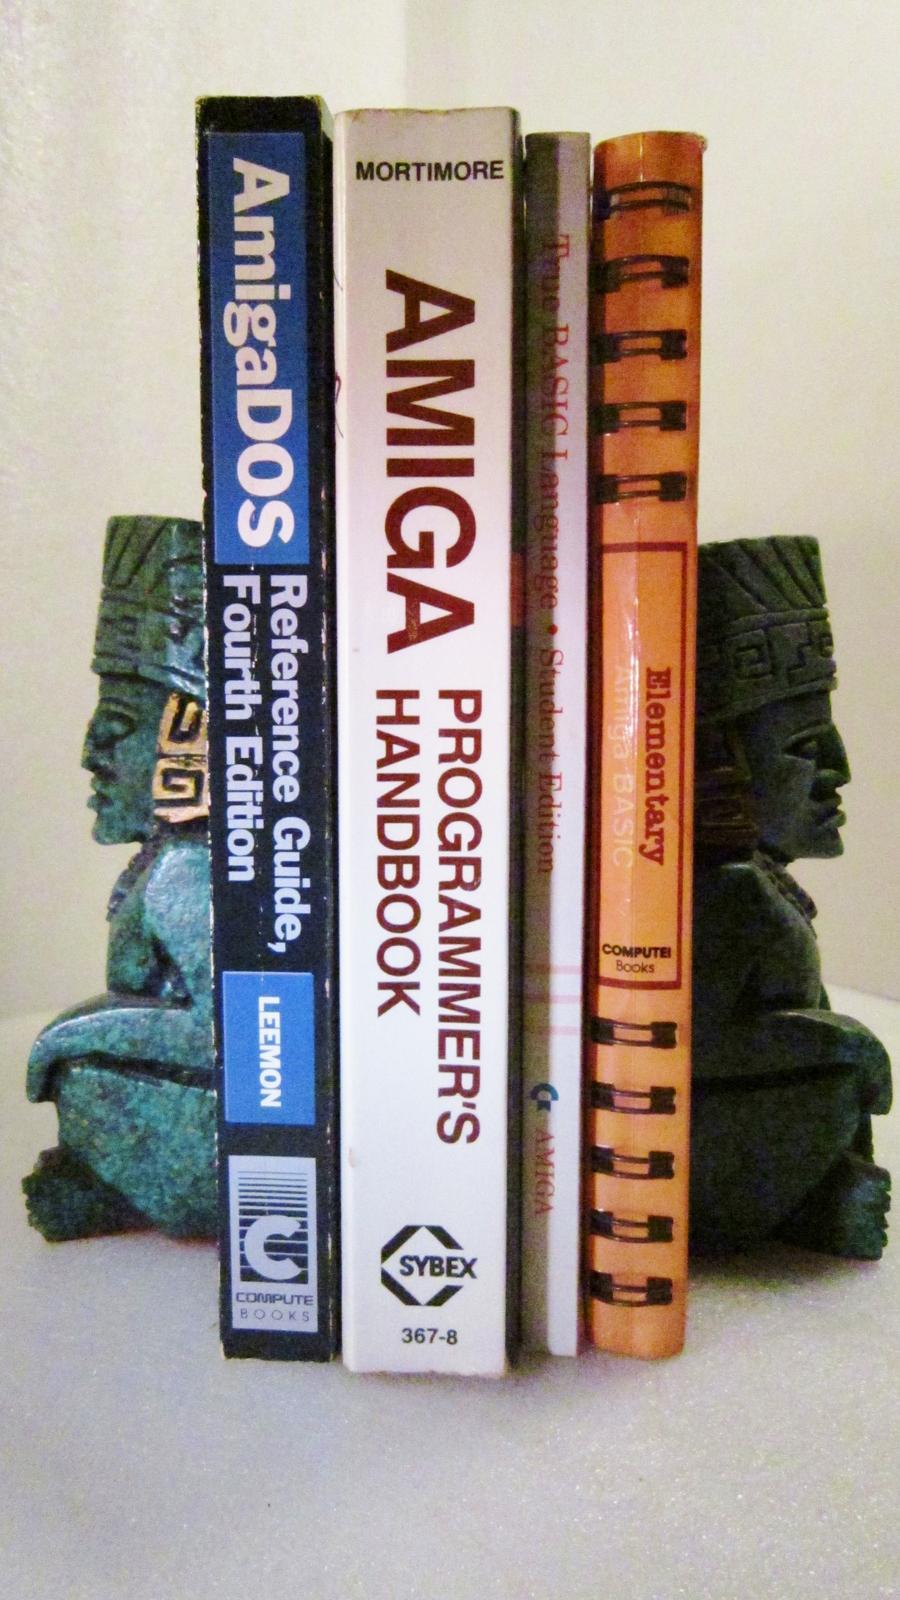 Amiga Computer Programming, Set of 4 books and 50 similar items